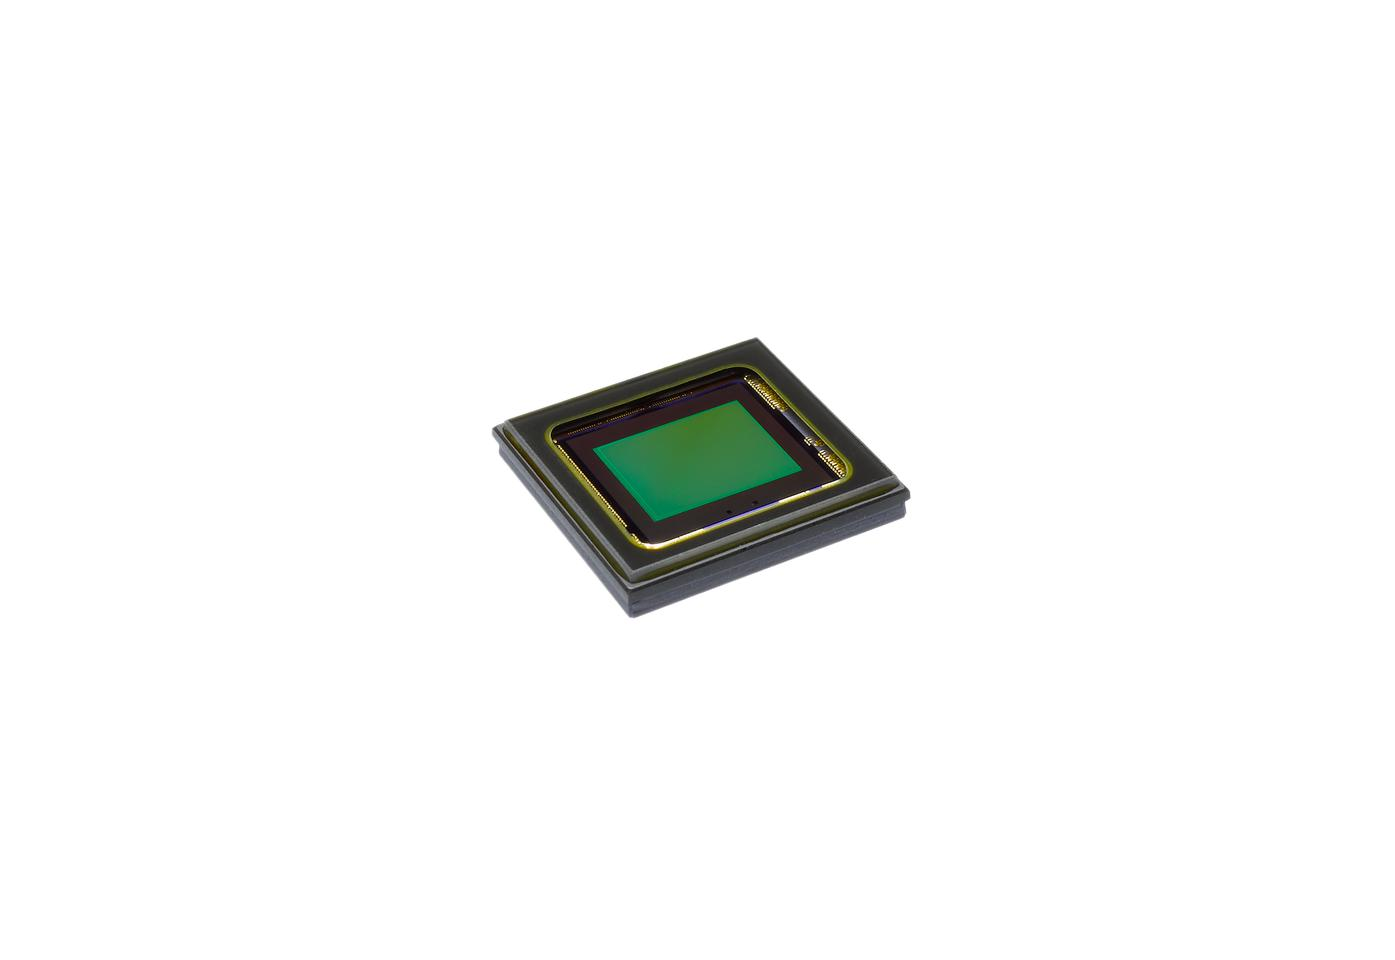 The Pentax Q's backlit, 12.4 megapixel, 1/2.3 inch (6.16 x 4.62 mm) CMOS image sensor